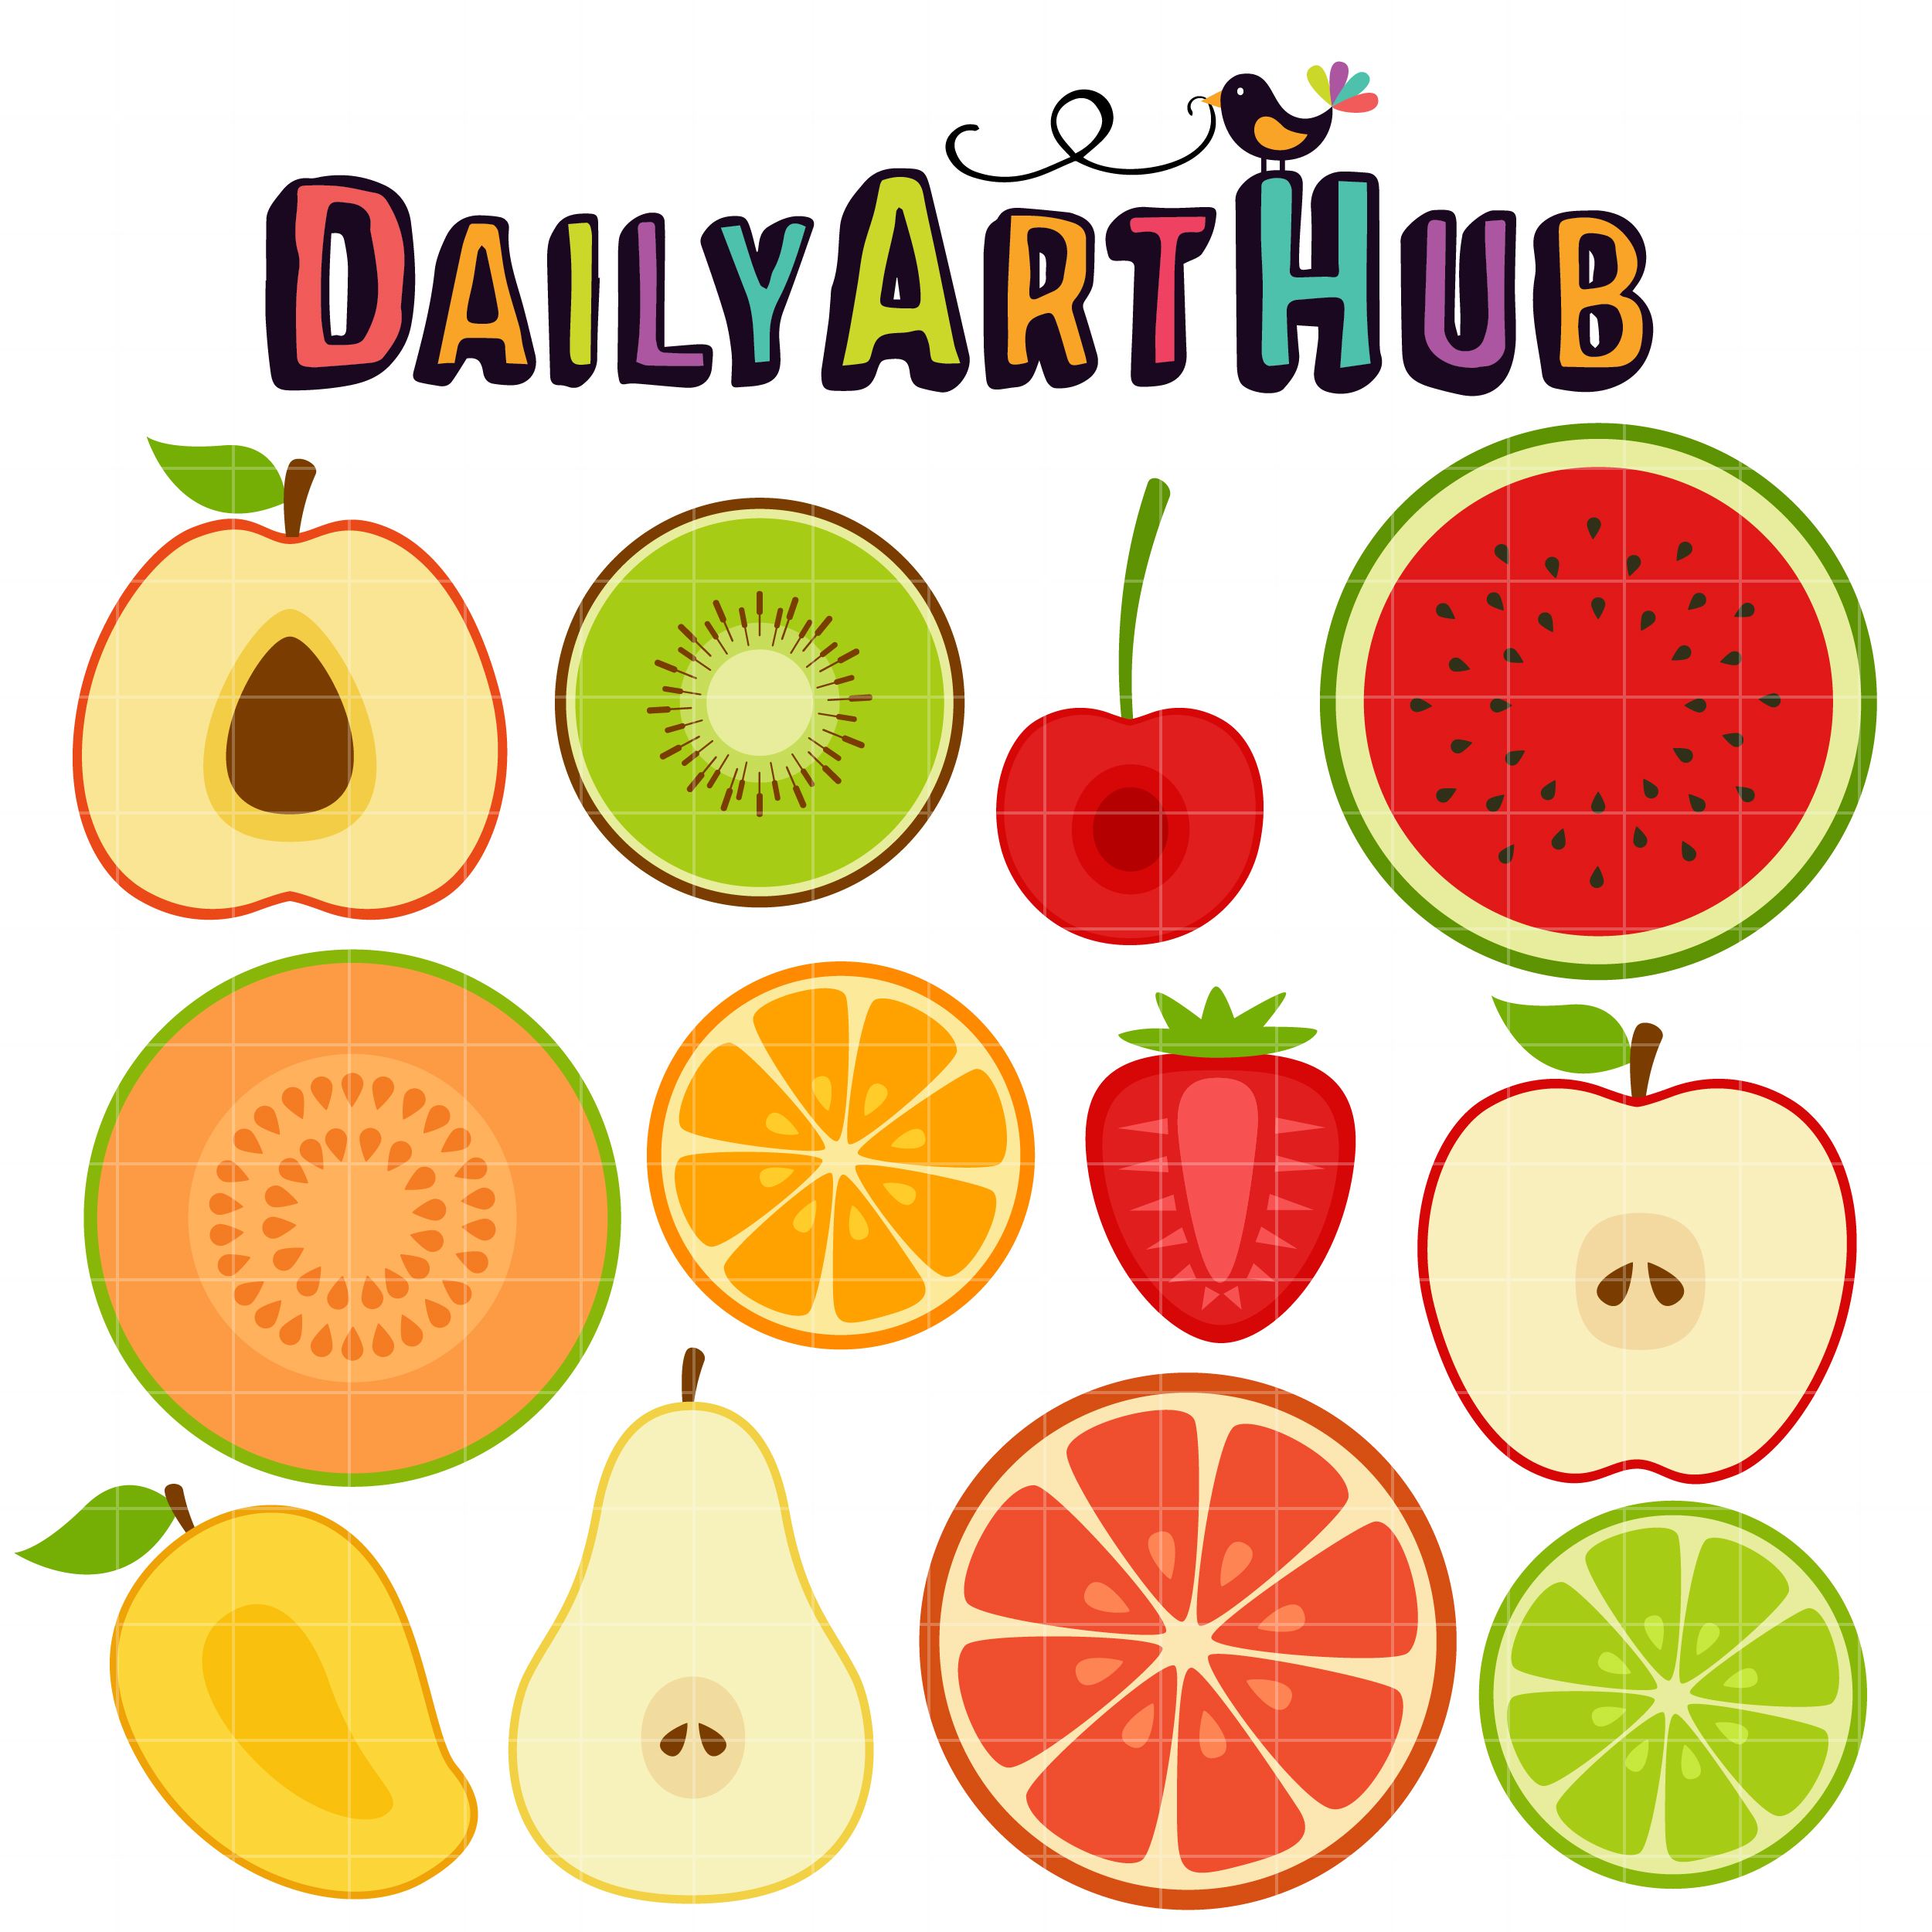 Fruit Slice Clip Art Set - Daily Art Hub - Free Clip Art ...